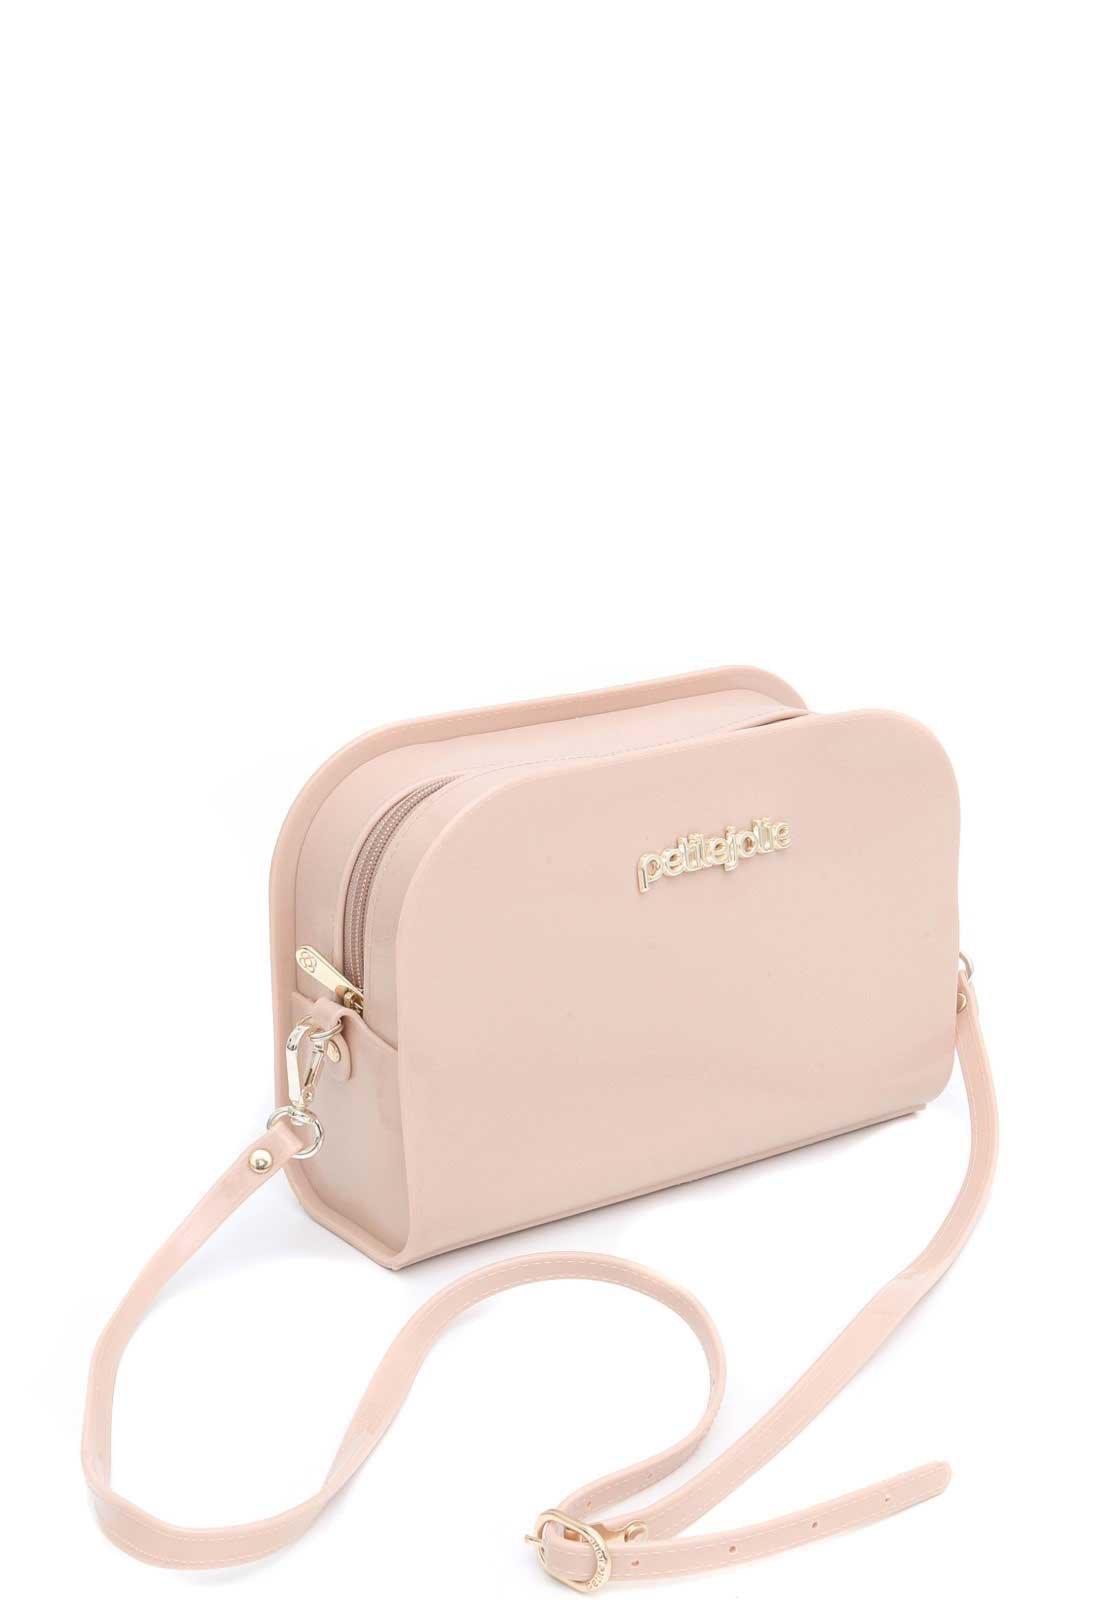 Bolsa Petite Jolie Pretty J-Lastic Nude - Compre Agora